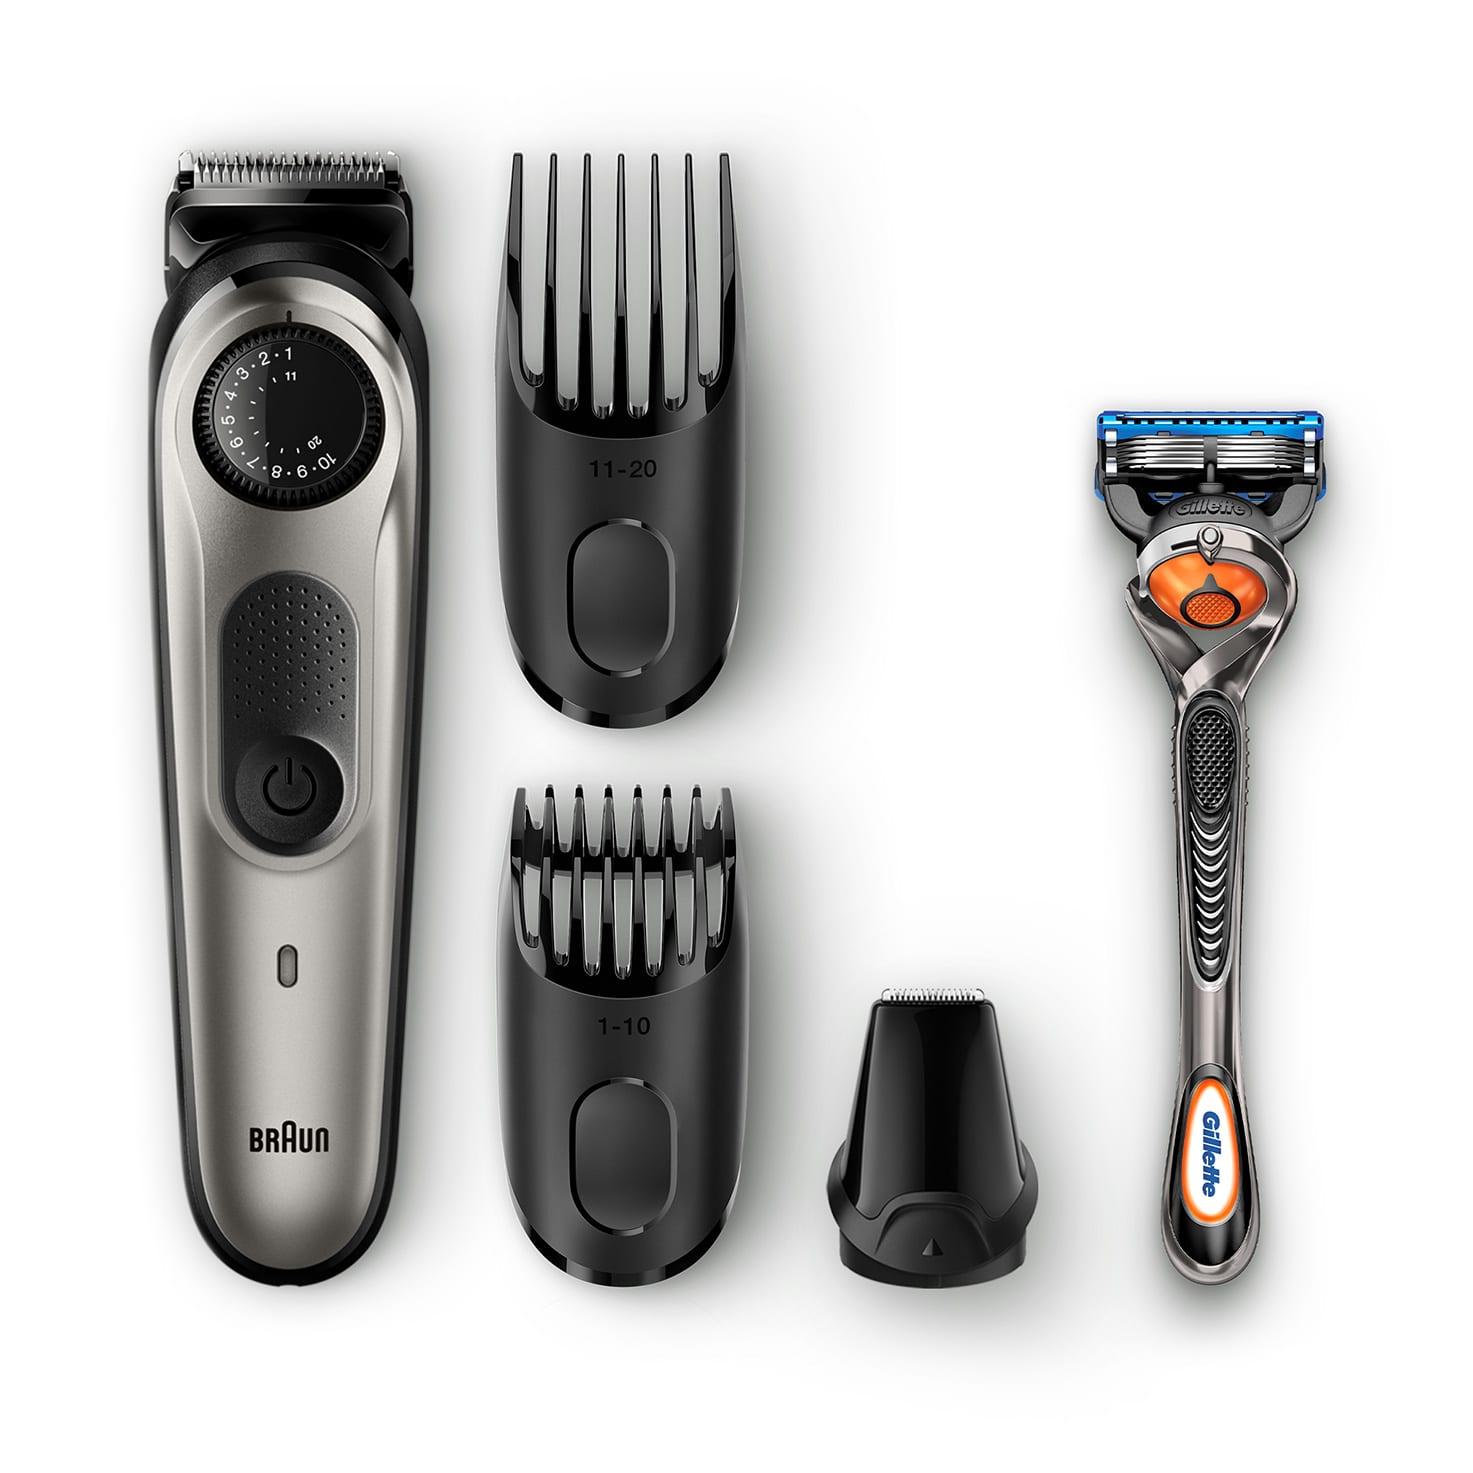 Braun Beard trimmer BT5060 with precision dial, 3 attachments and Gillette Fusion5 ProGlide razor